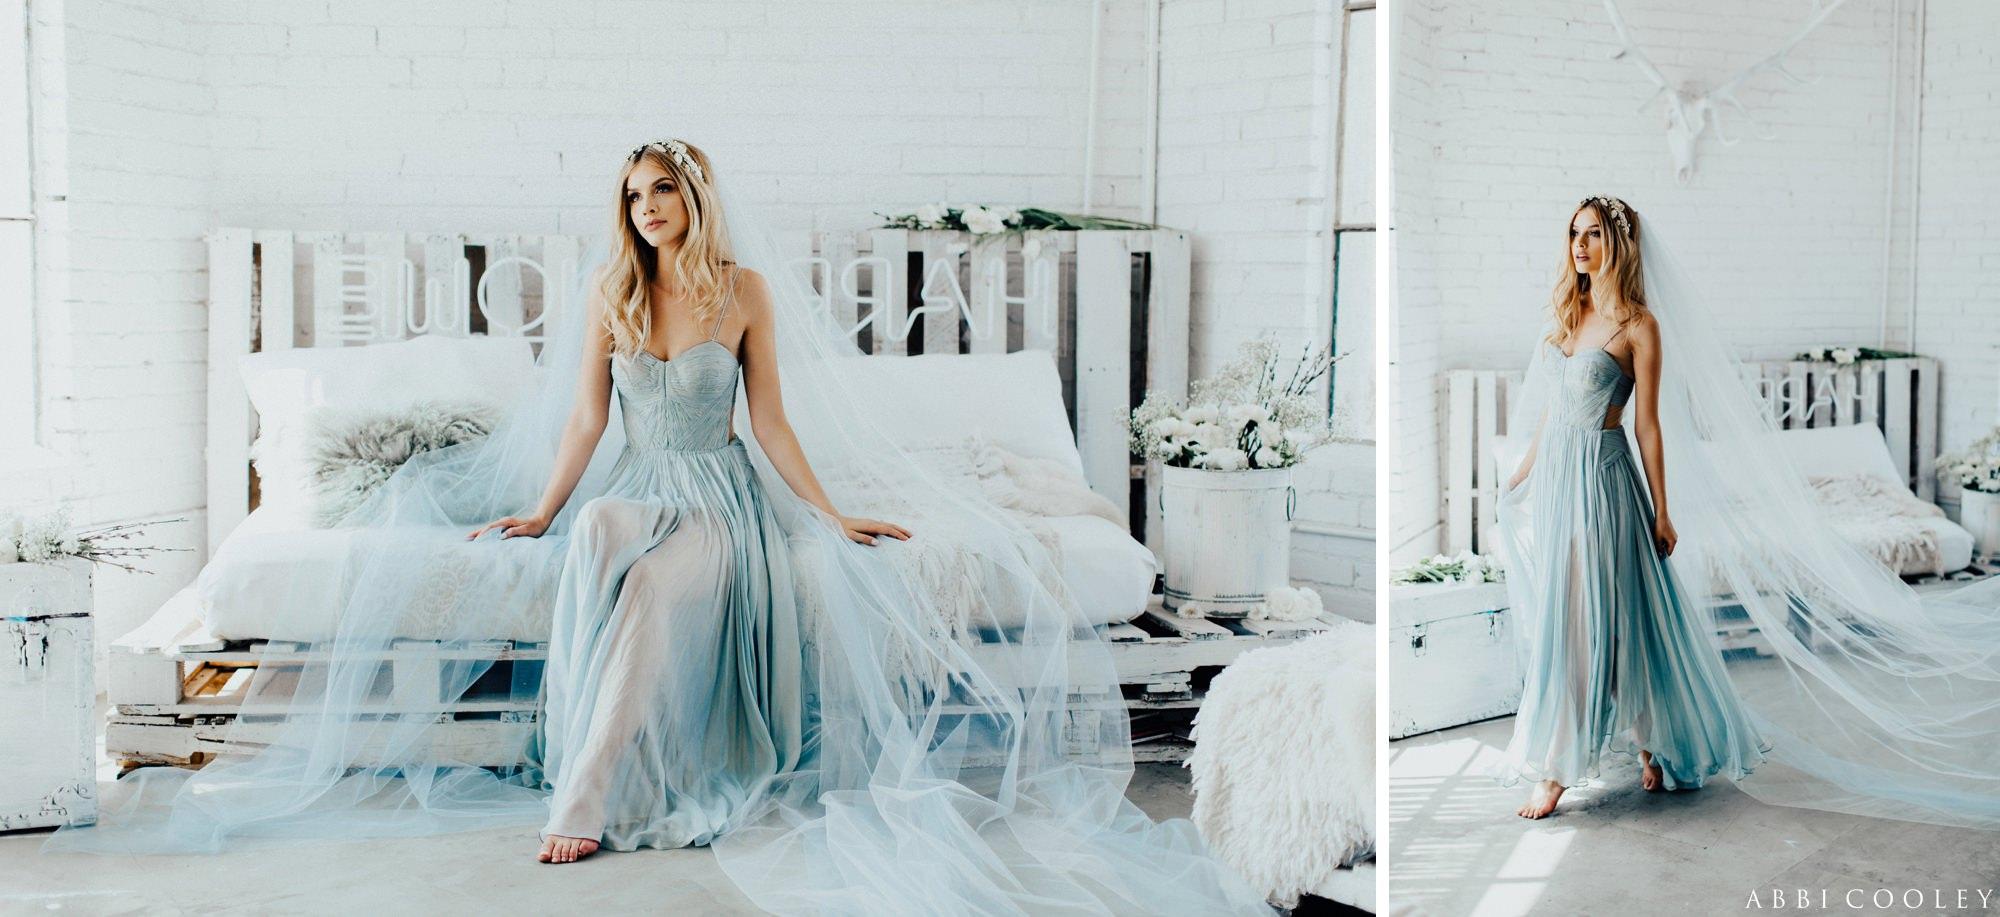 blue wedding gown The Veiled Beauty 2017 Lookbook